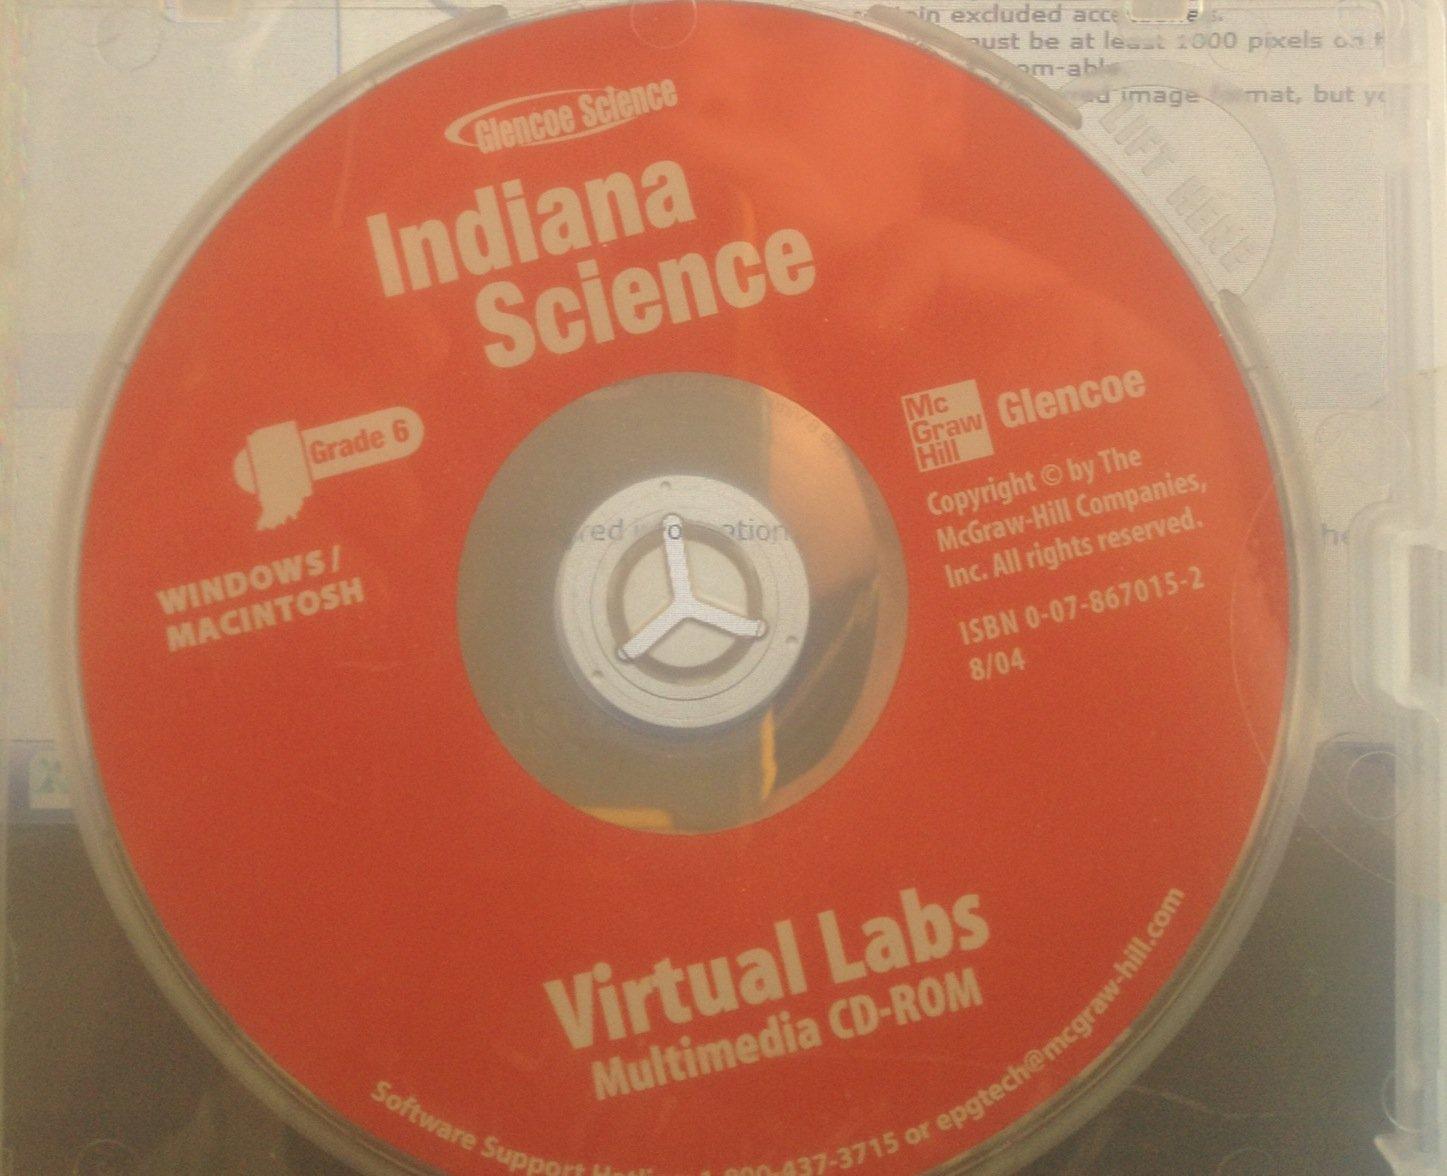 Glencoe Science Indiana Science Grade 6 Virtual Labs